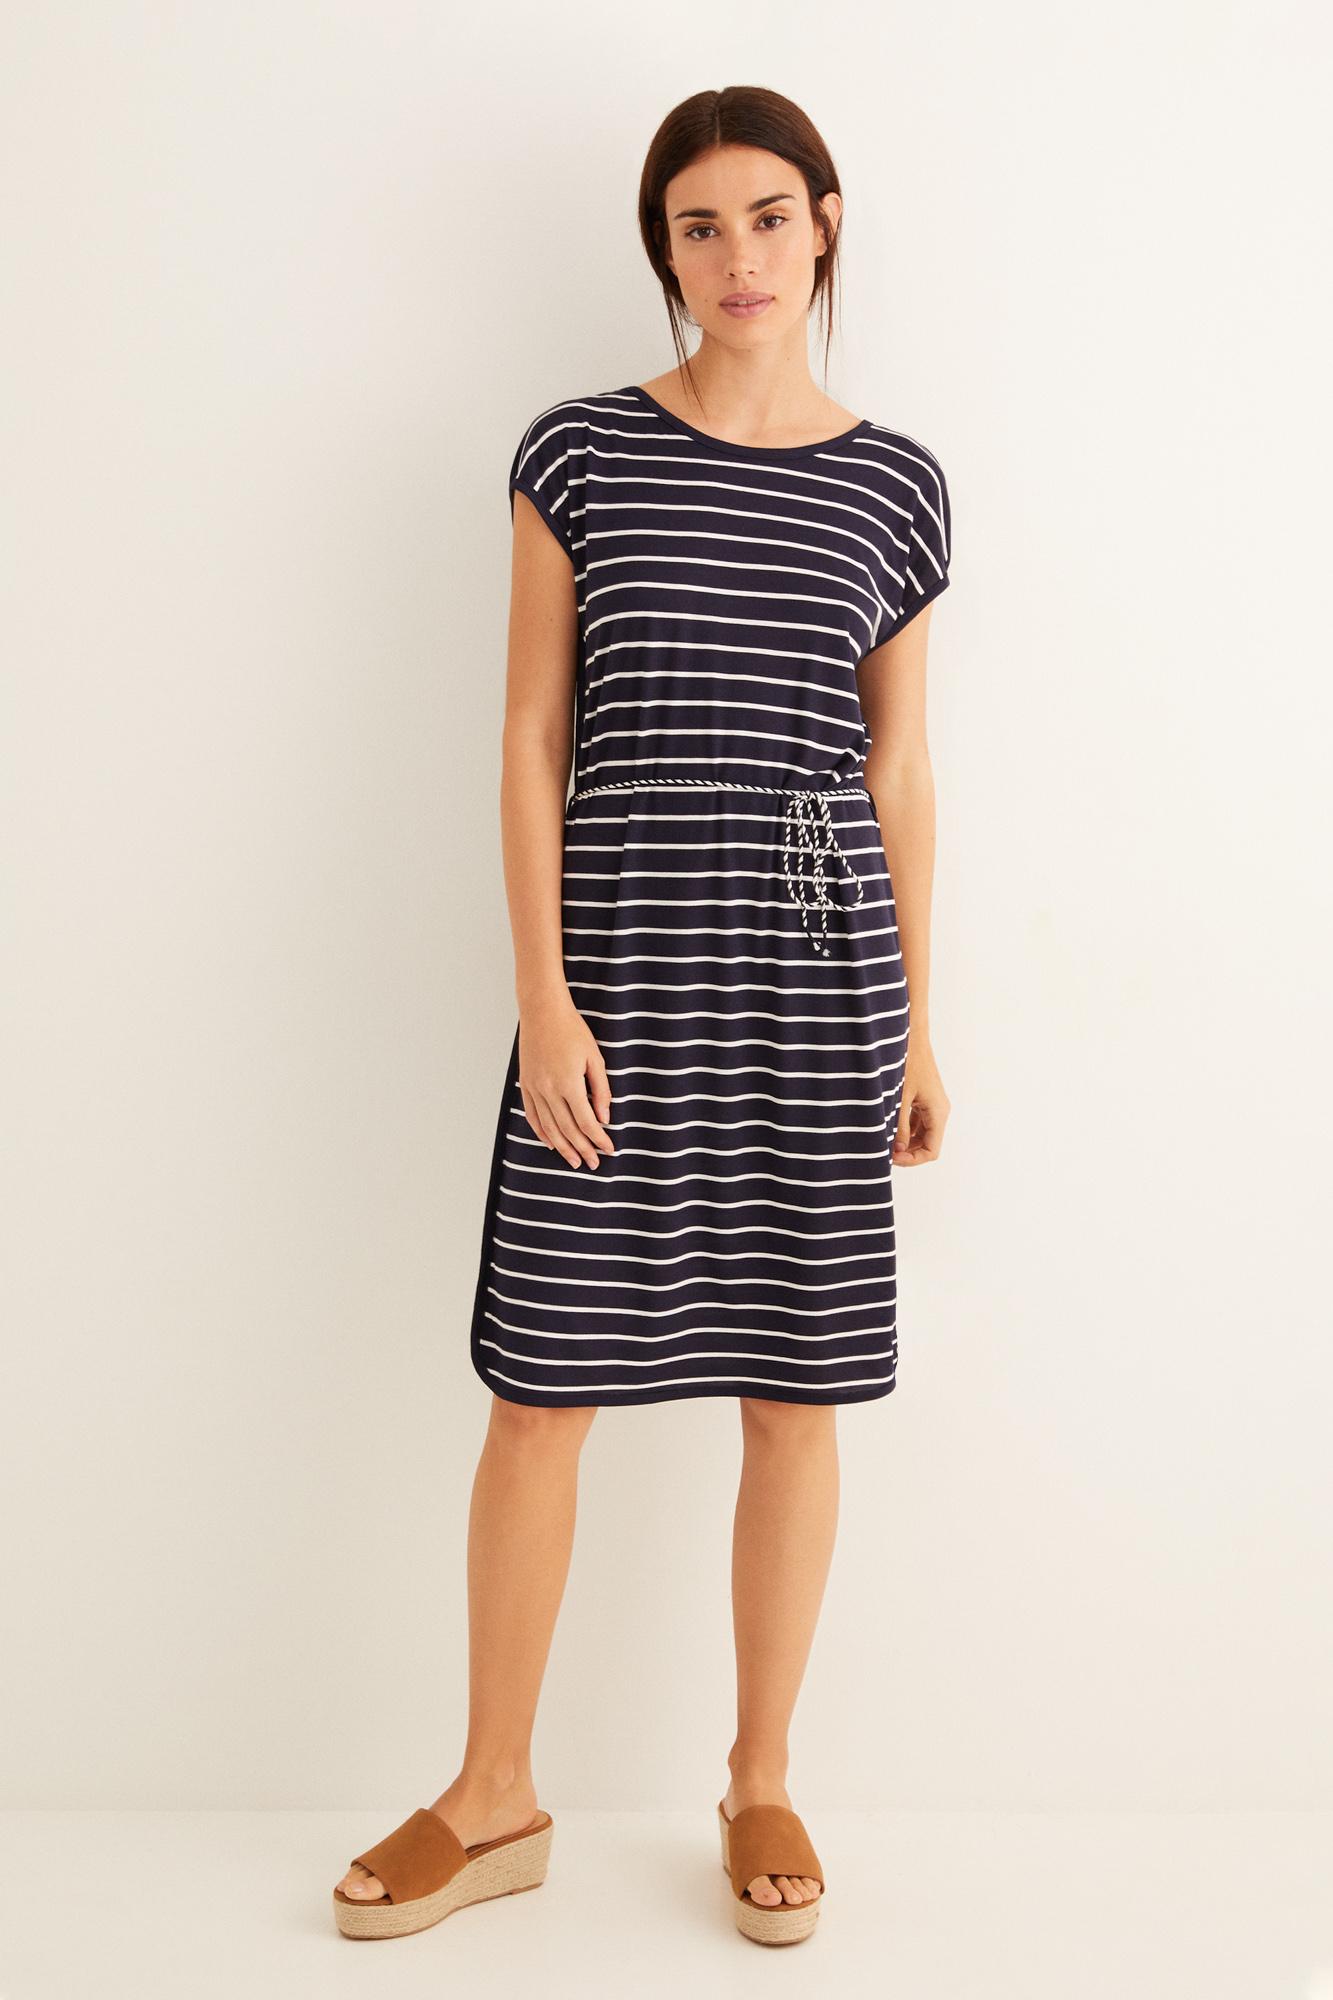 Vestido navy cinturón | Beachwear | Women'secret